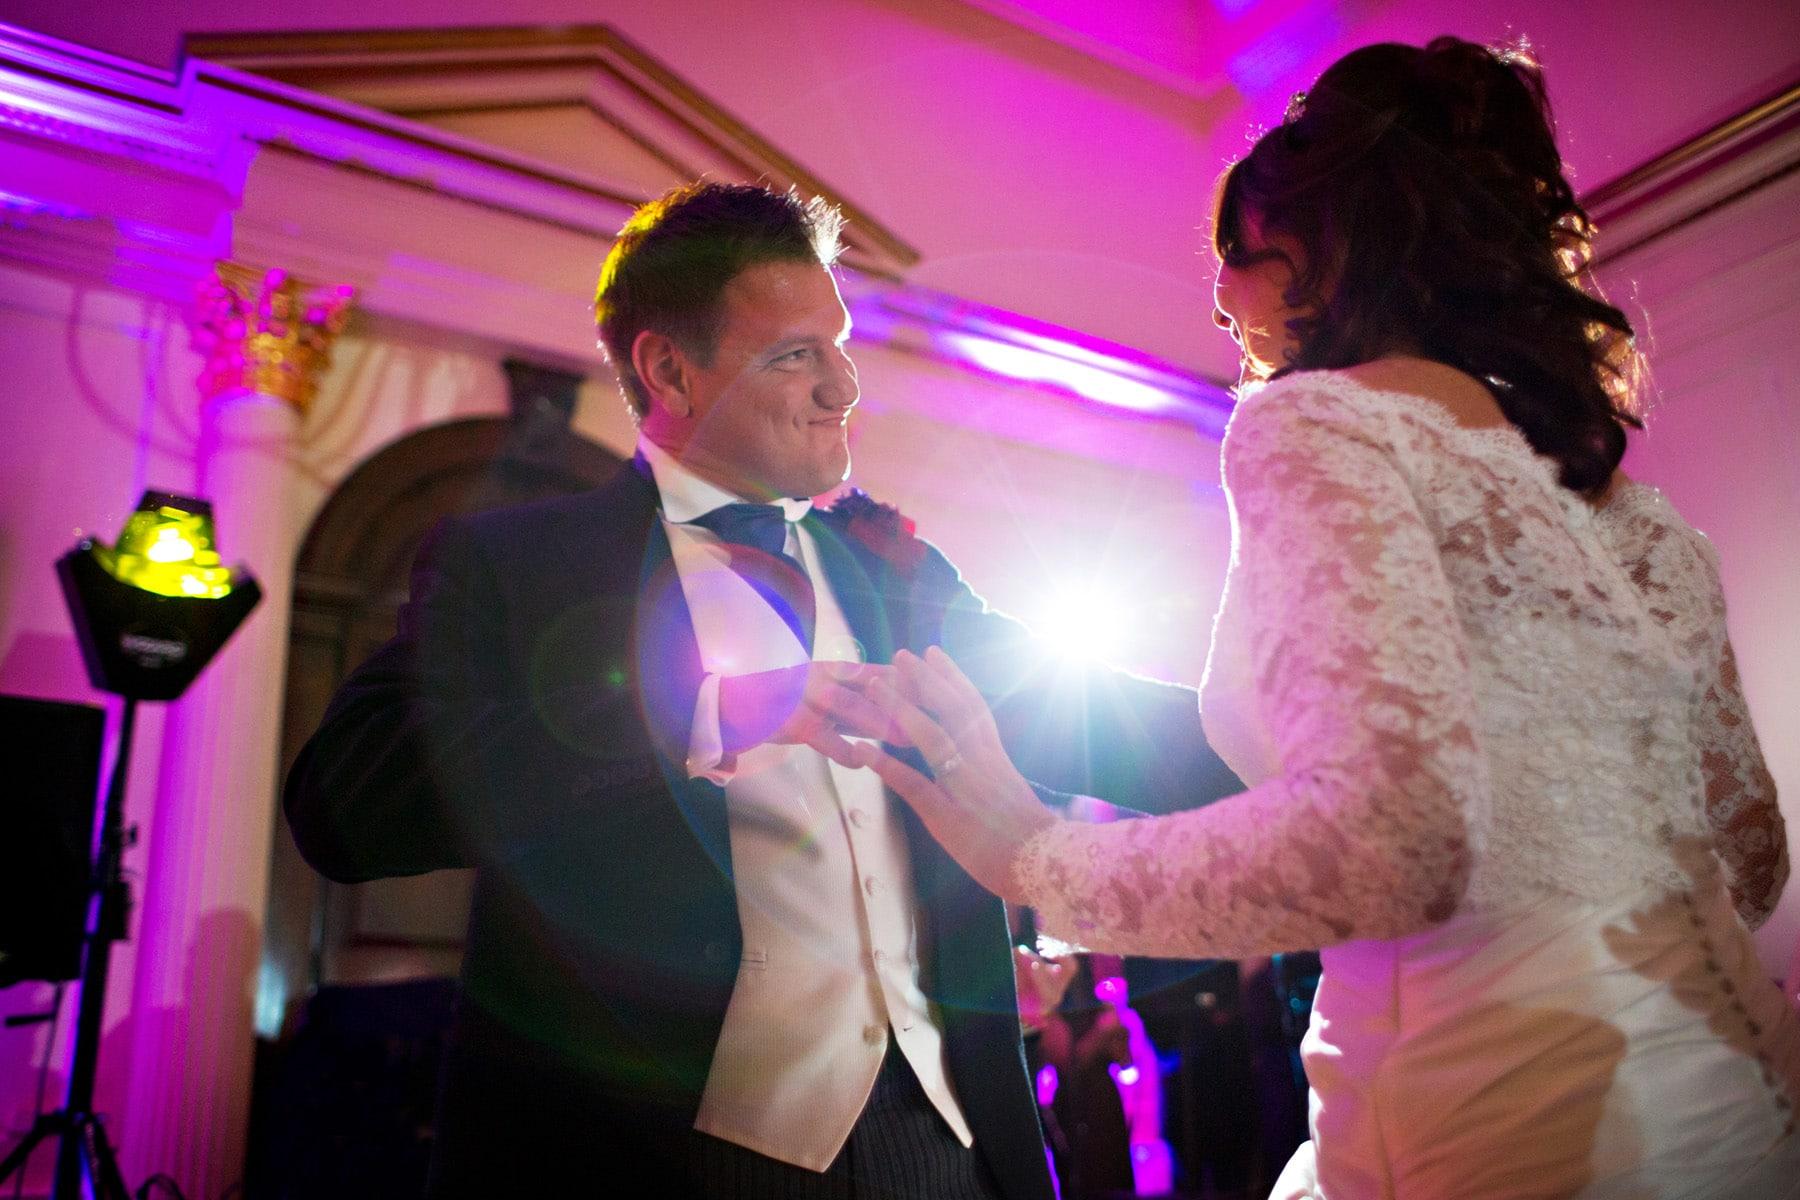 Hintlesham Hall Wedding Photography - Anja and Adam